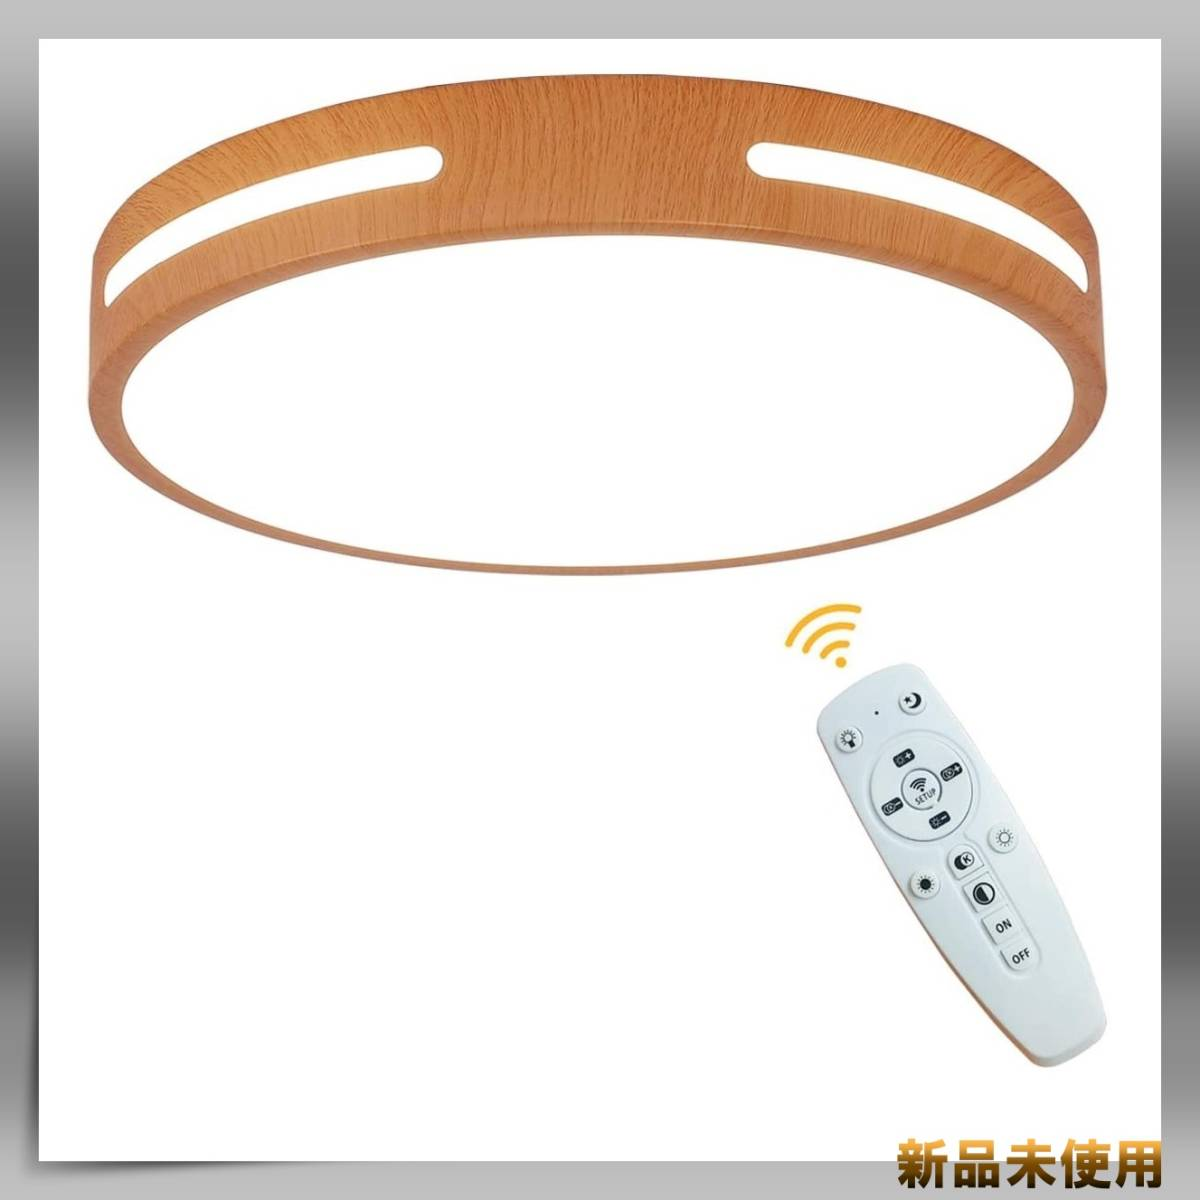 LEDシーリングライト 30W 天井照明器具 木目調 和風 薄型 シーリングライト 無段階調光調色 リモコン付き_画像1